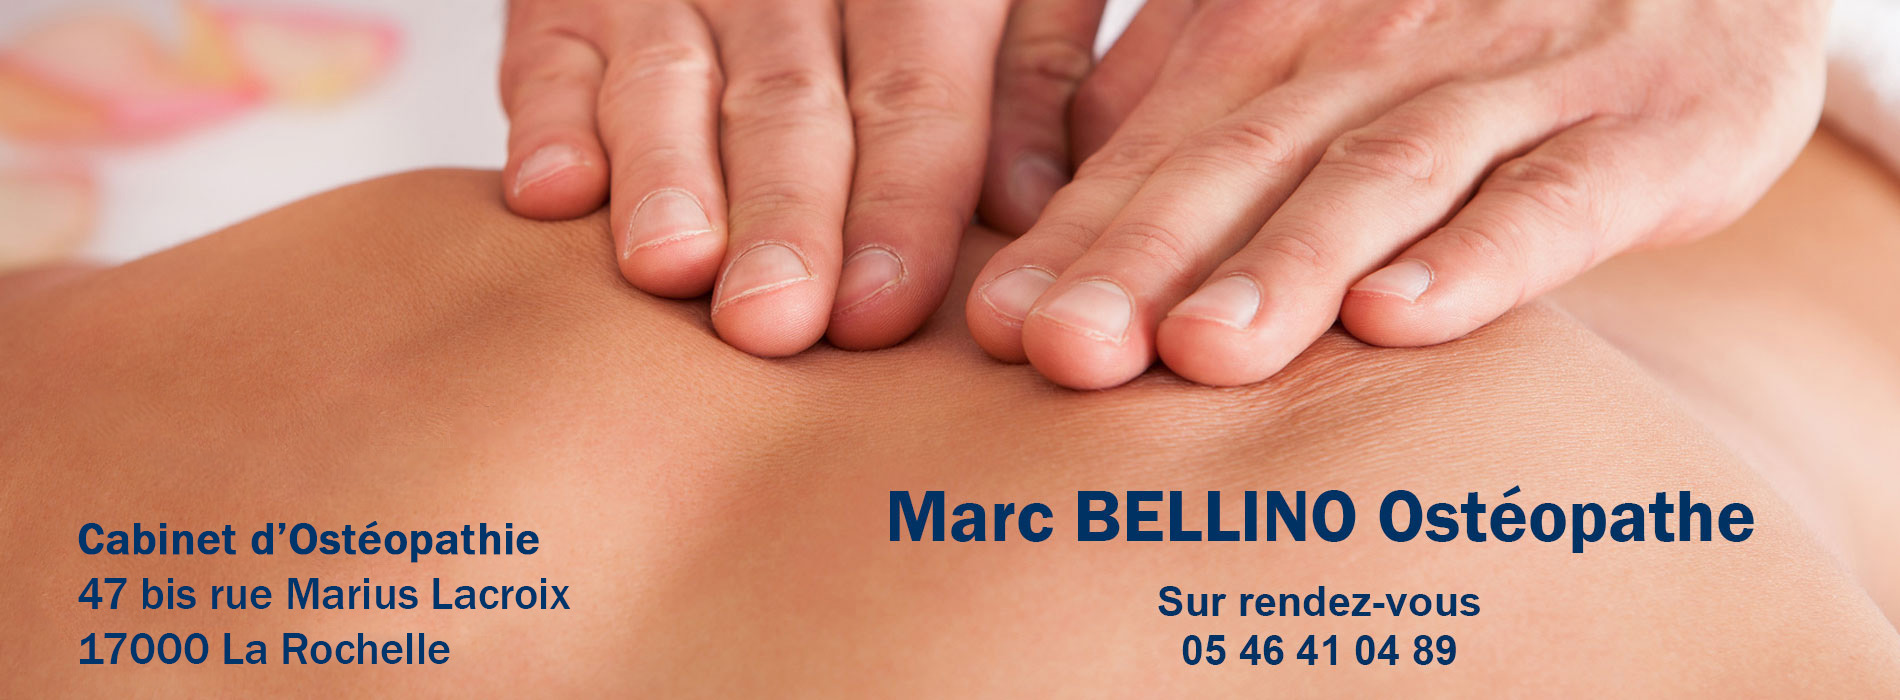 Marc Bellino Ostéopathe à La Rochelle